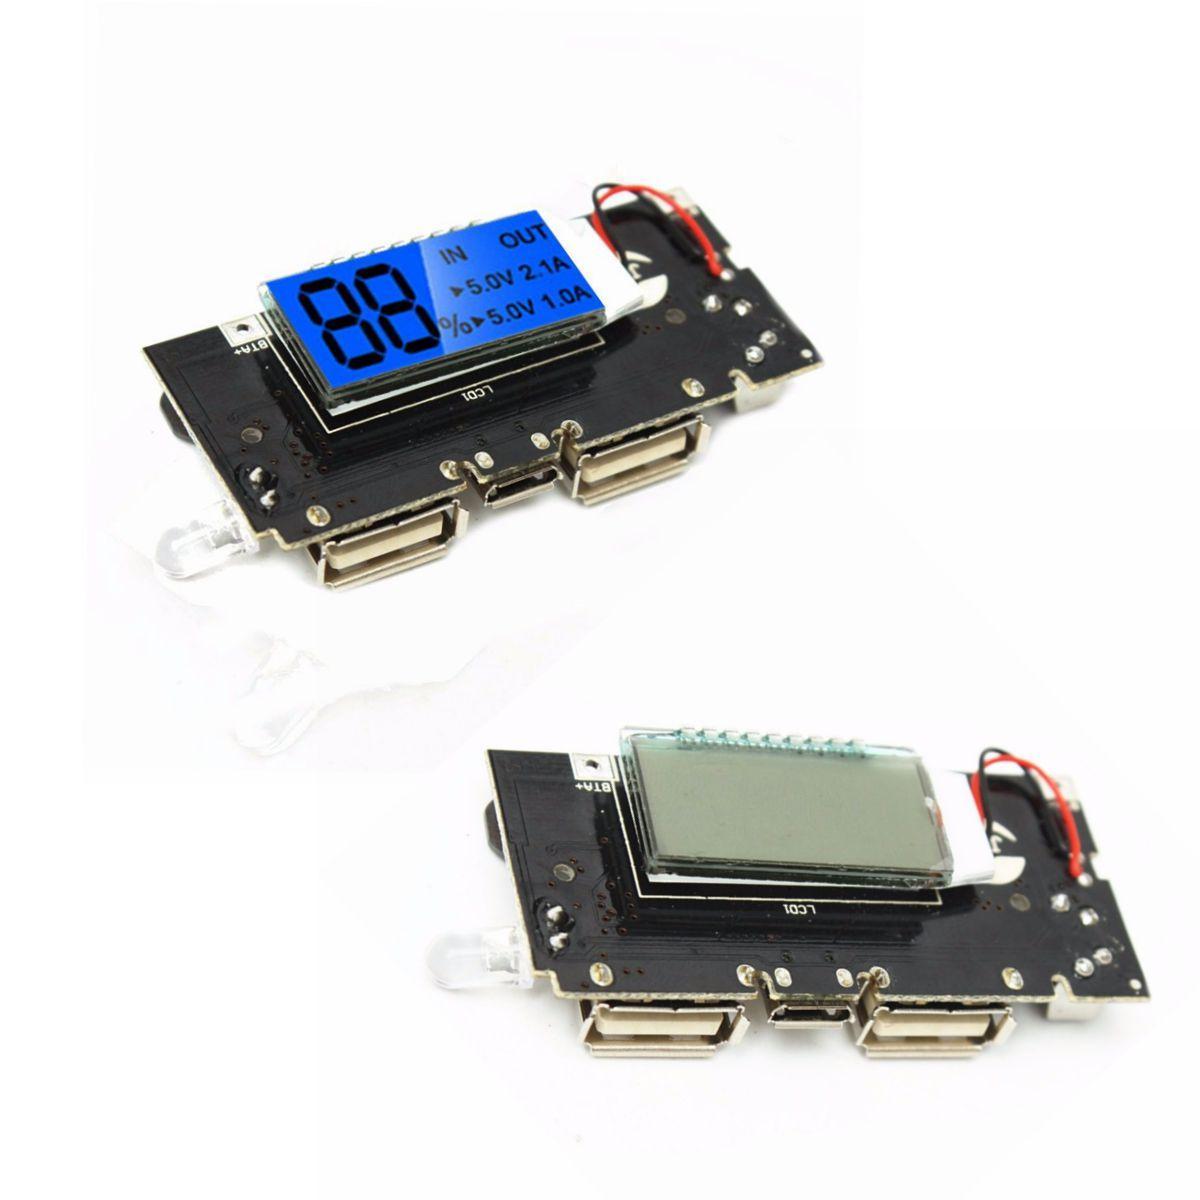 2 पीसीएस डुअल यूएसबी 5V 1 ए 2.1 ए मोबाइल पावर बैंक 18650 बैटरी चार्जर पीसीबी मॉड्यूल बोर्ड